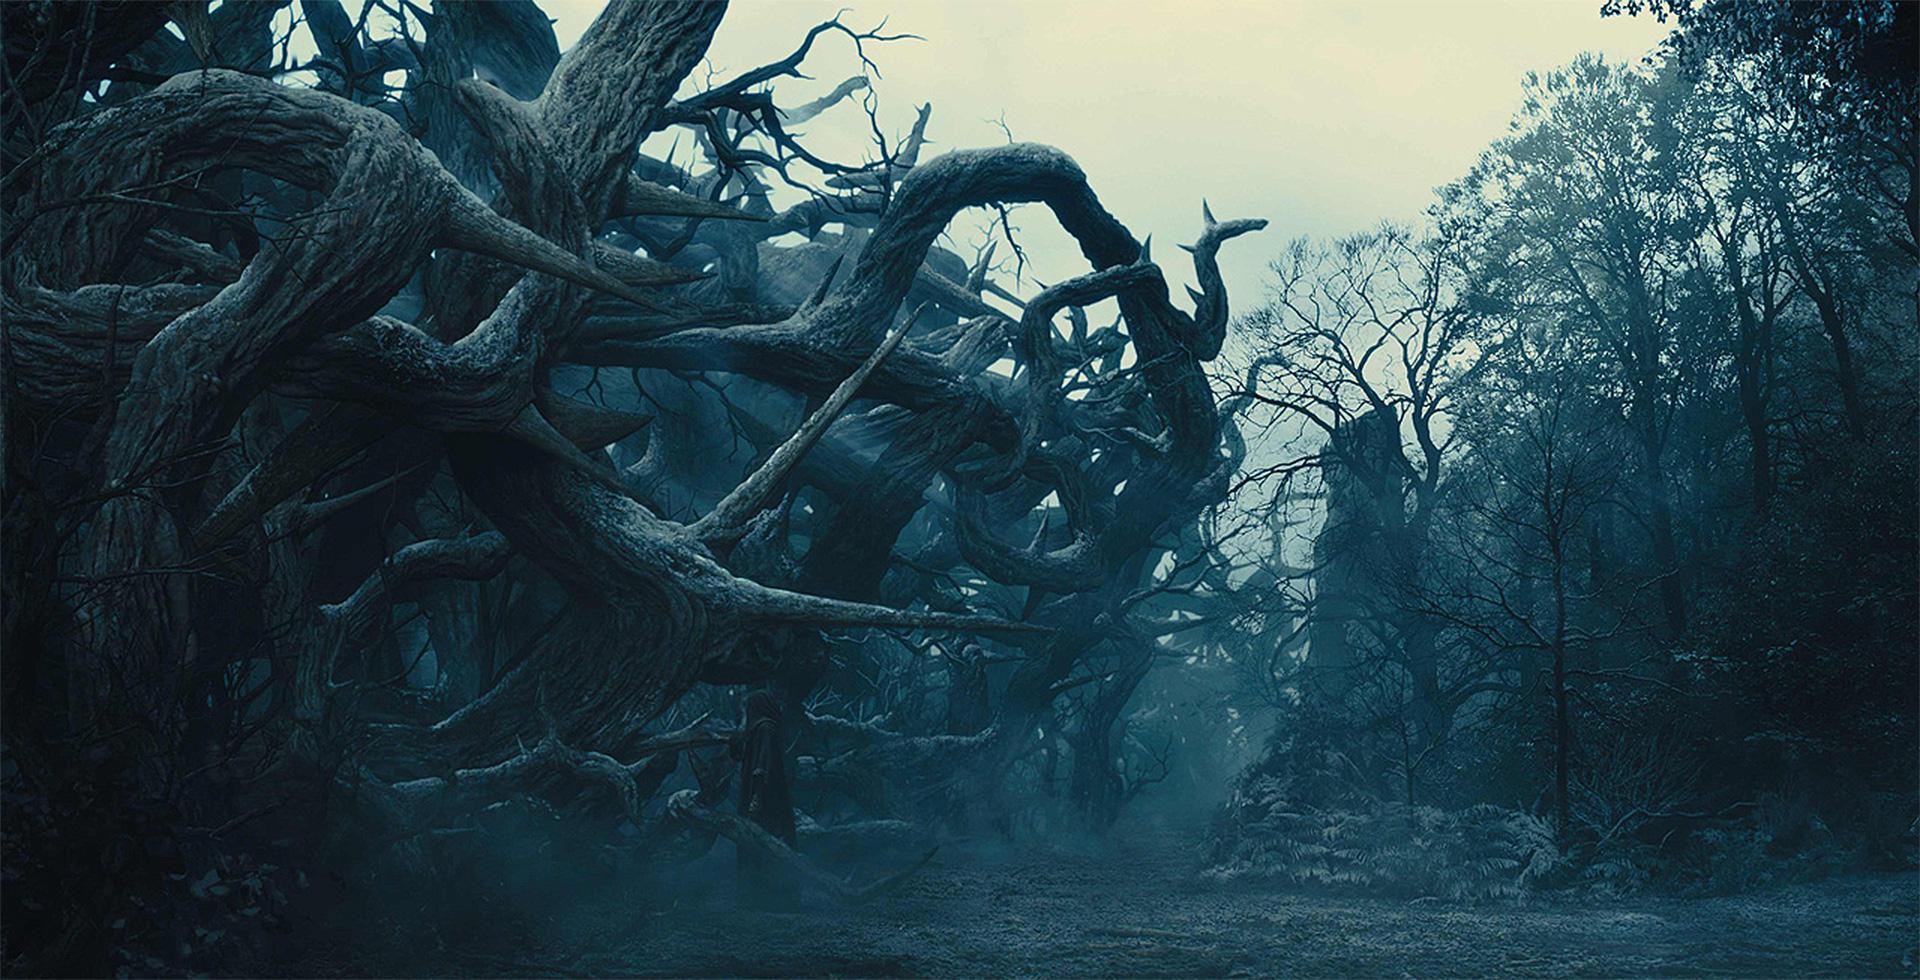 3. Maleficent_DMP_IgorStaritsin.jpg